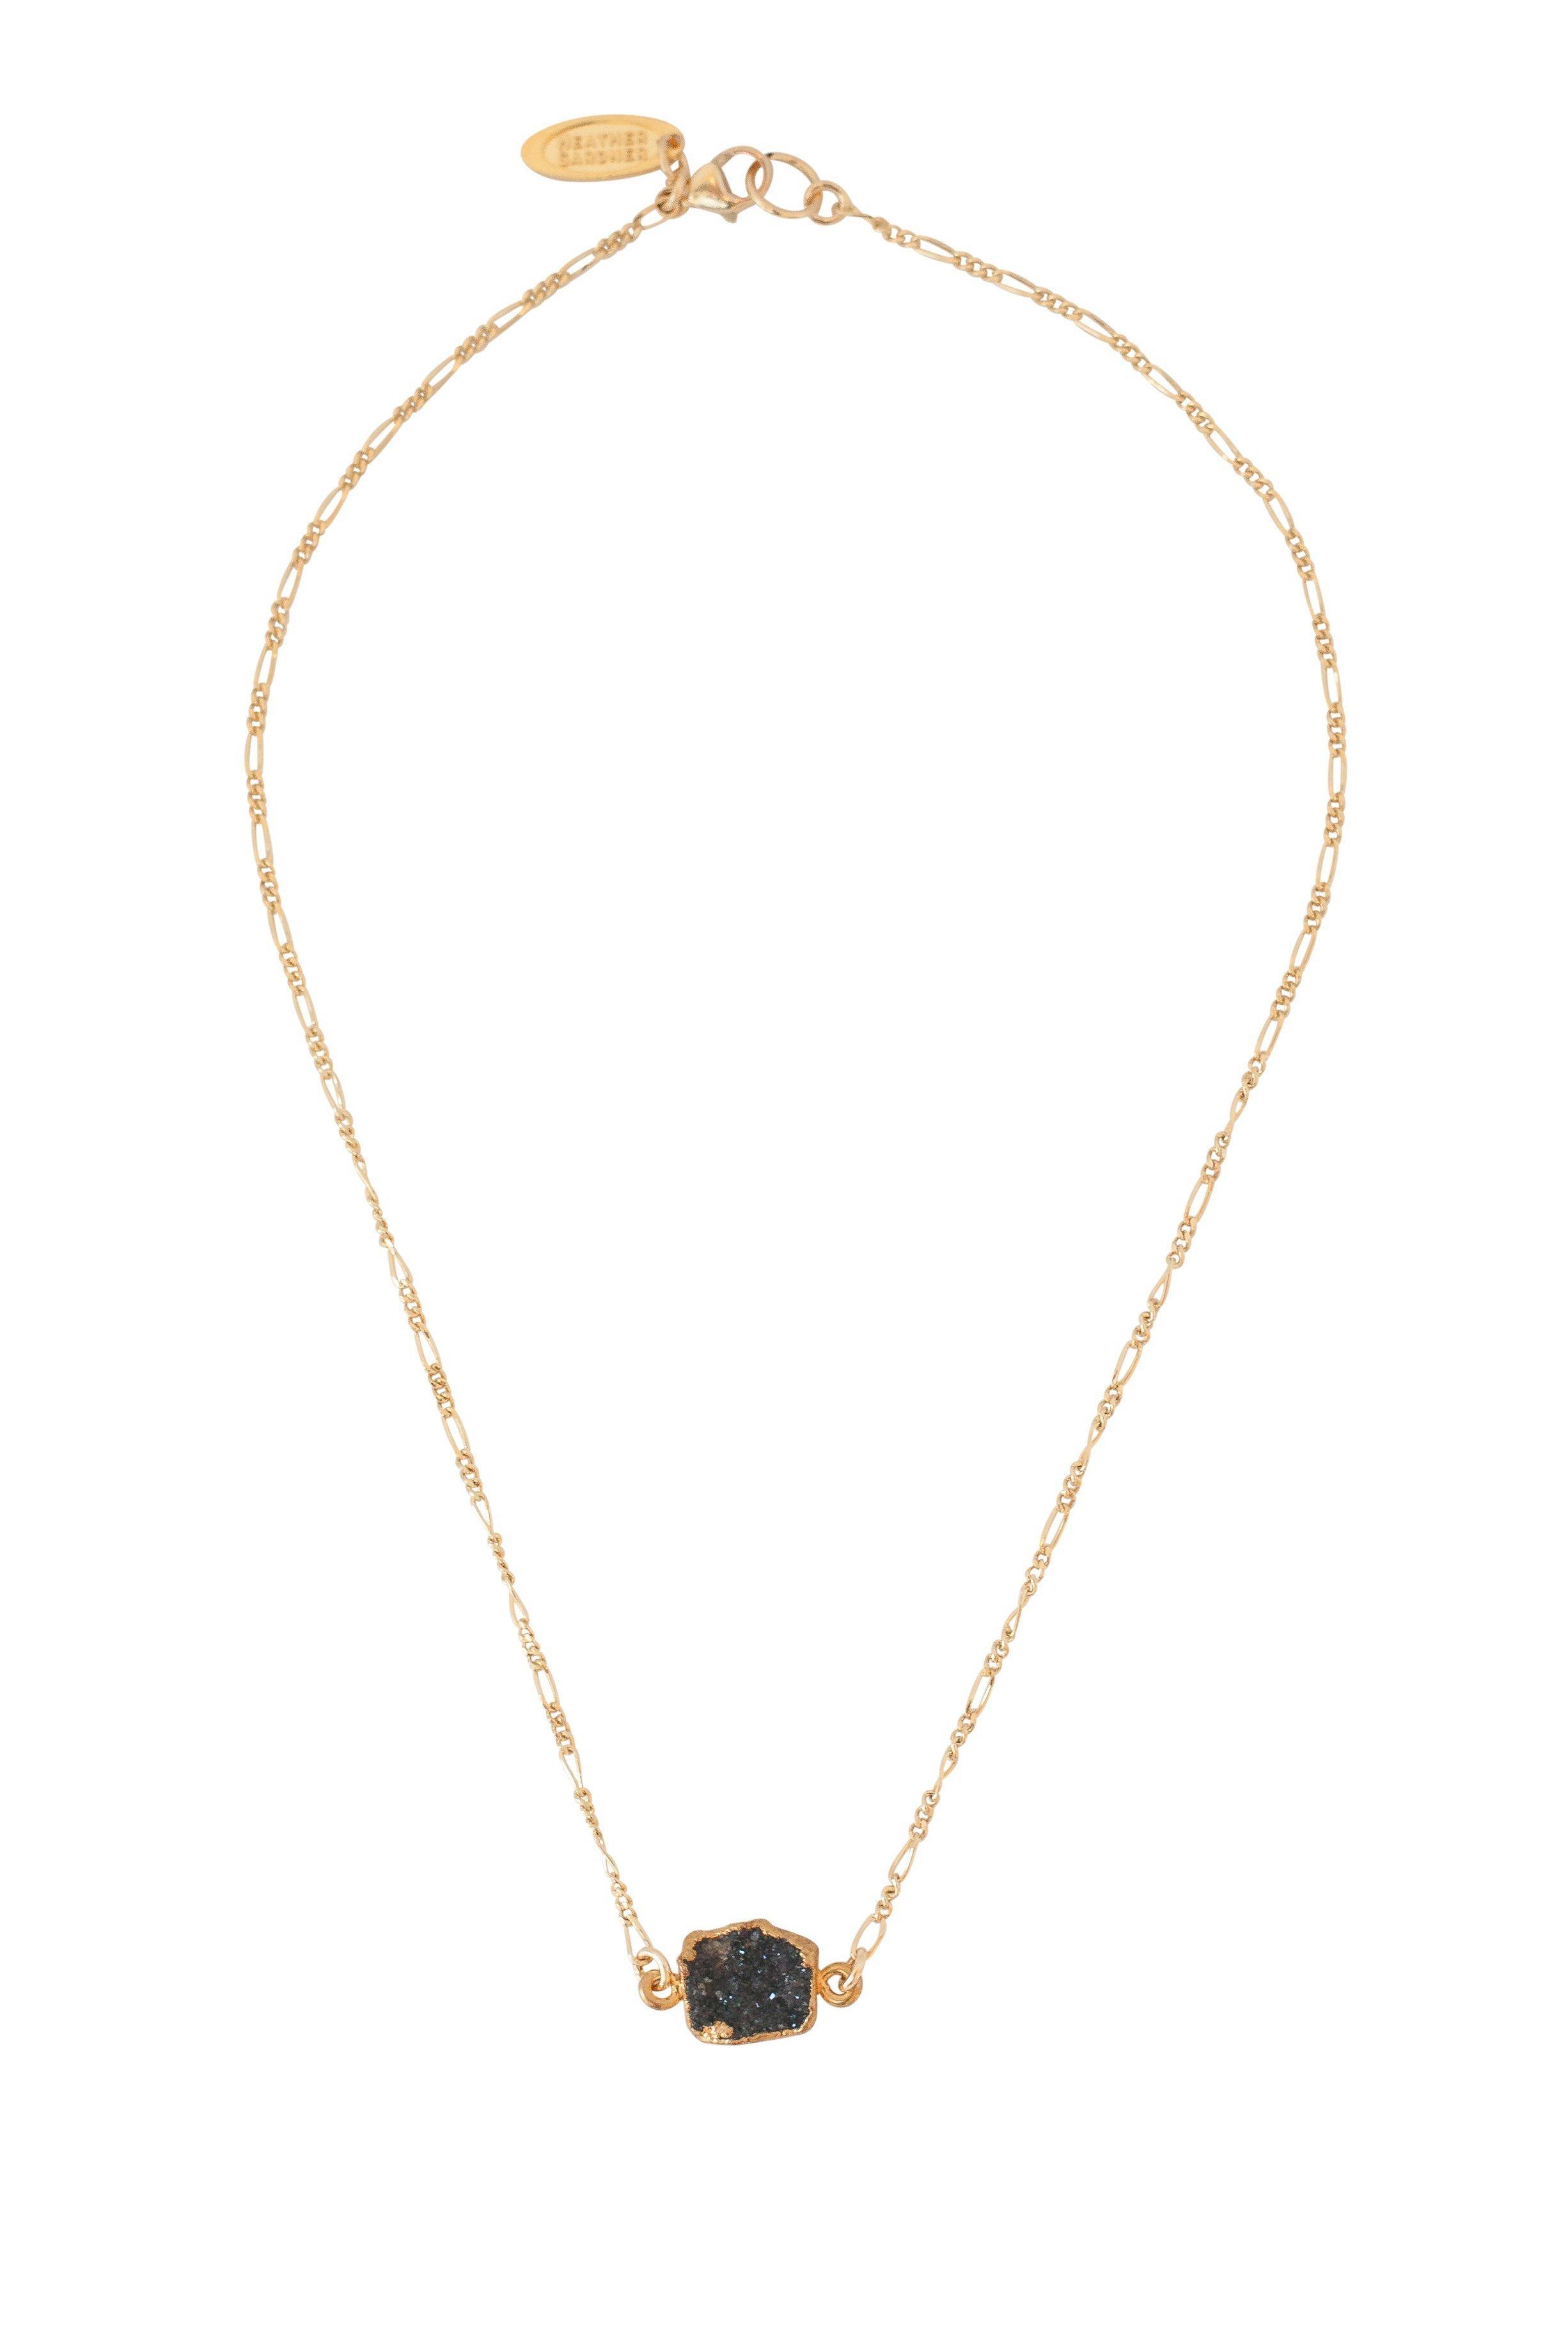 Heather Gardner - Black Druzy Necklace- ONLY ONE LEFT